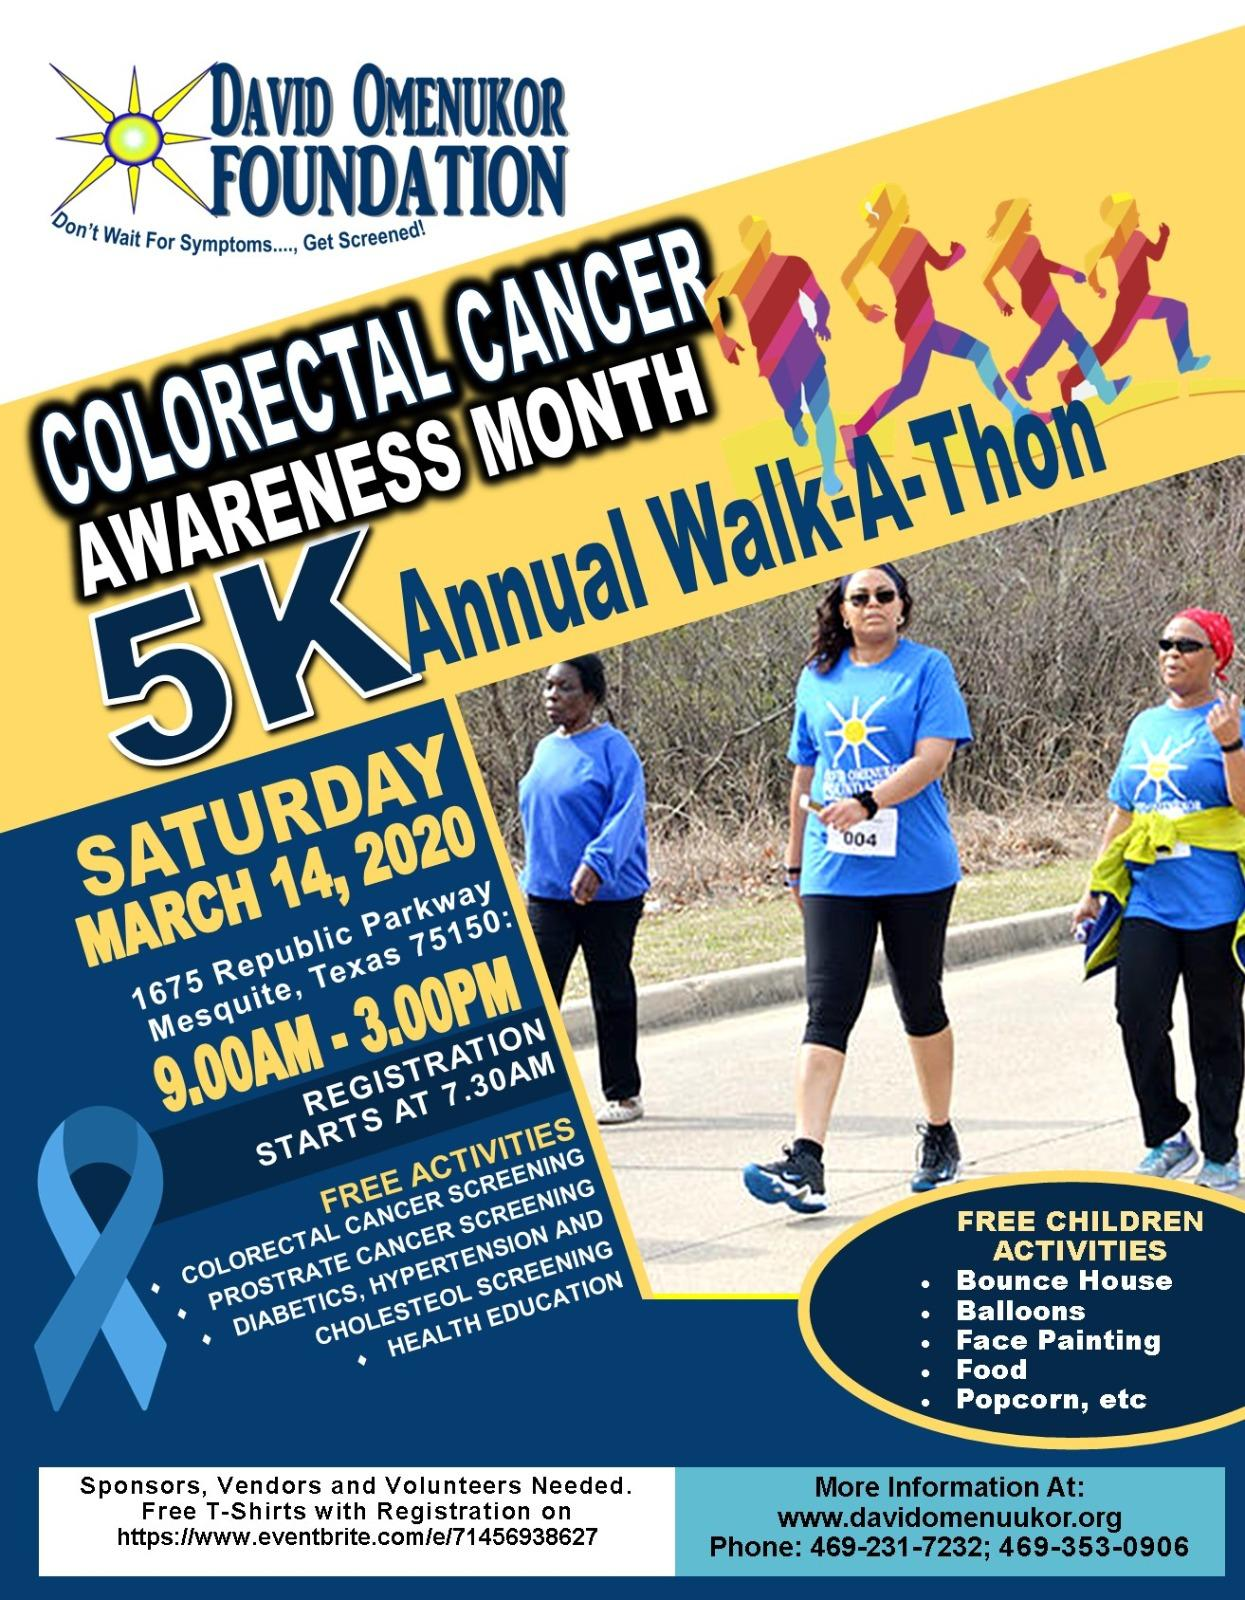 Colorectal Cancer Awareness Month 5k Walkathon 14 Mar 2020